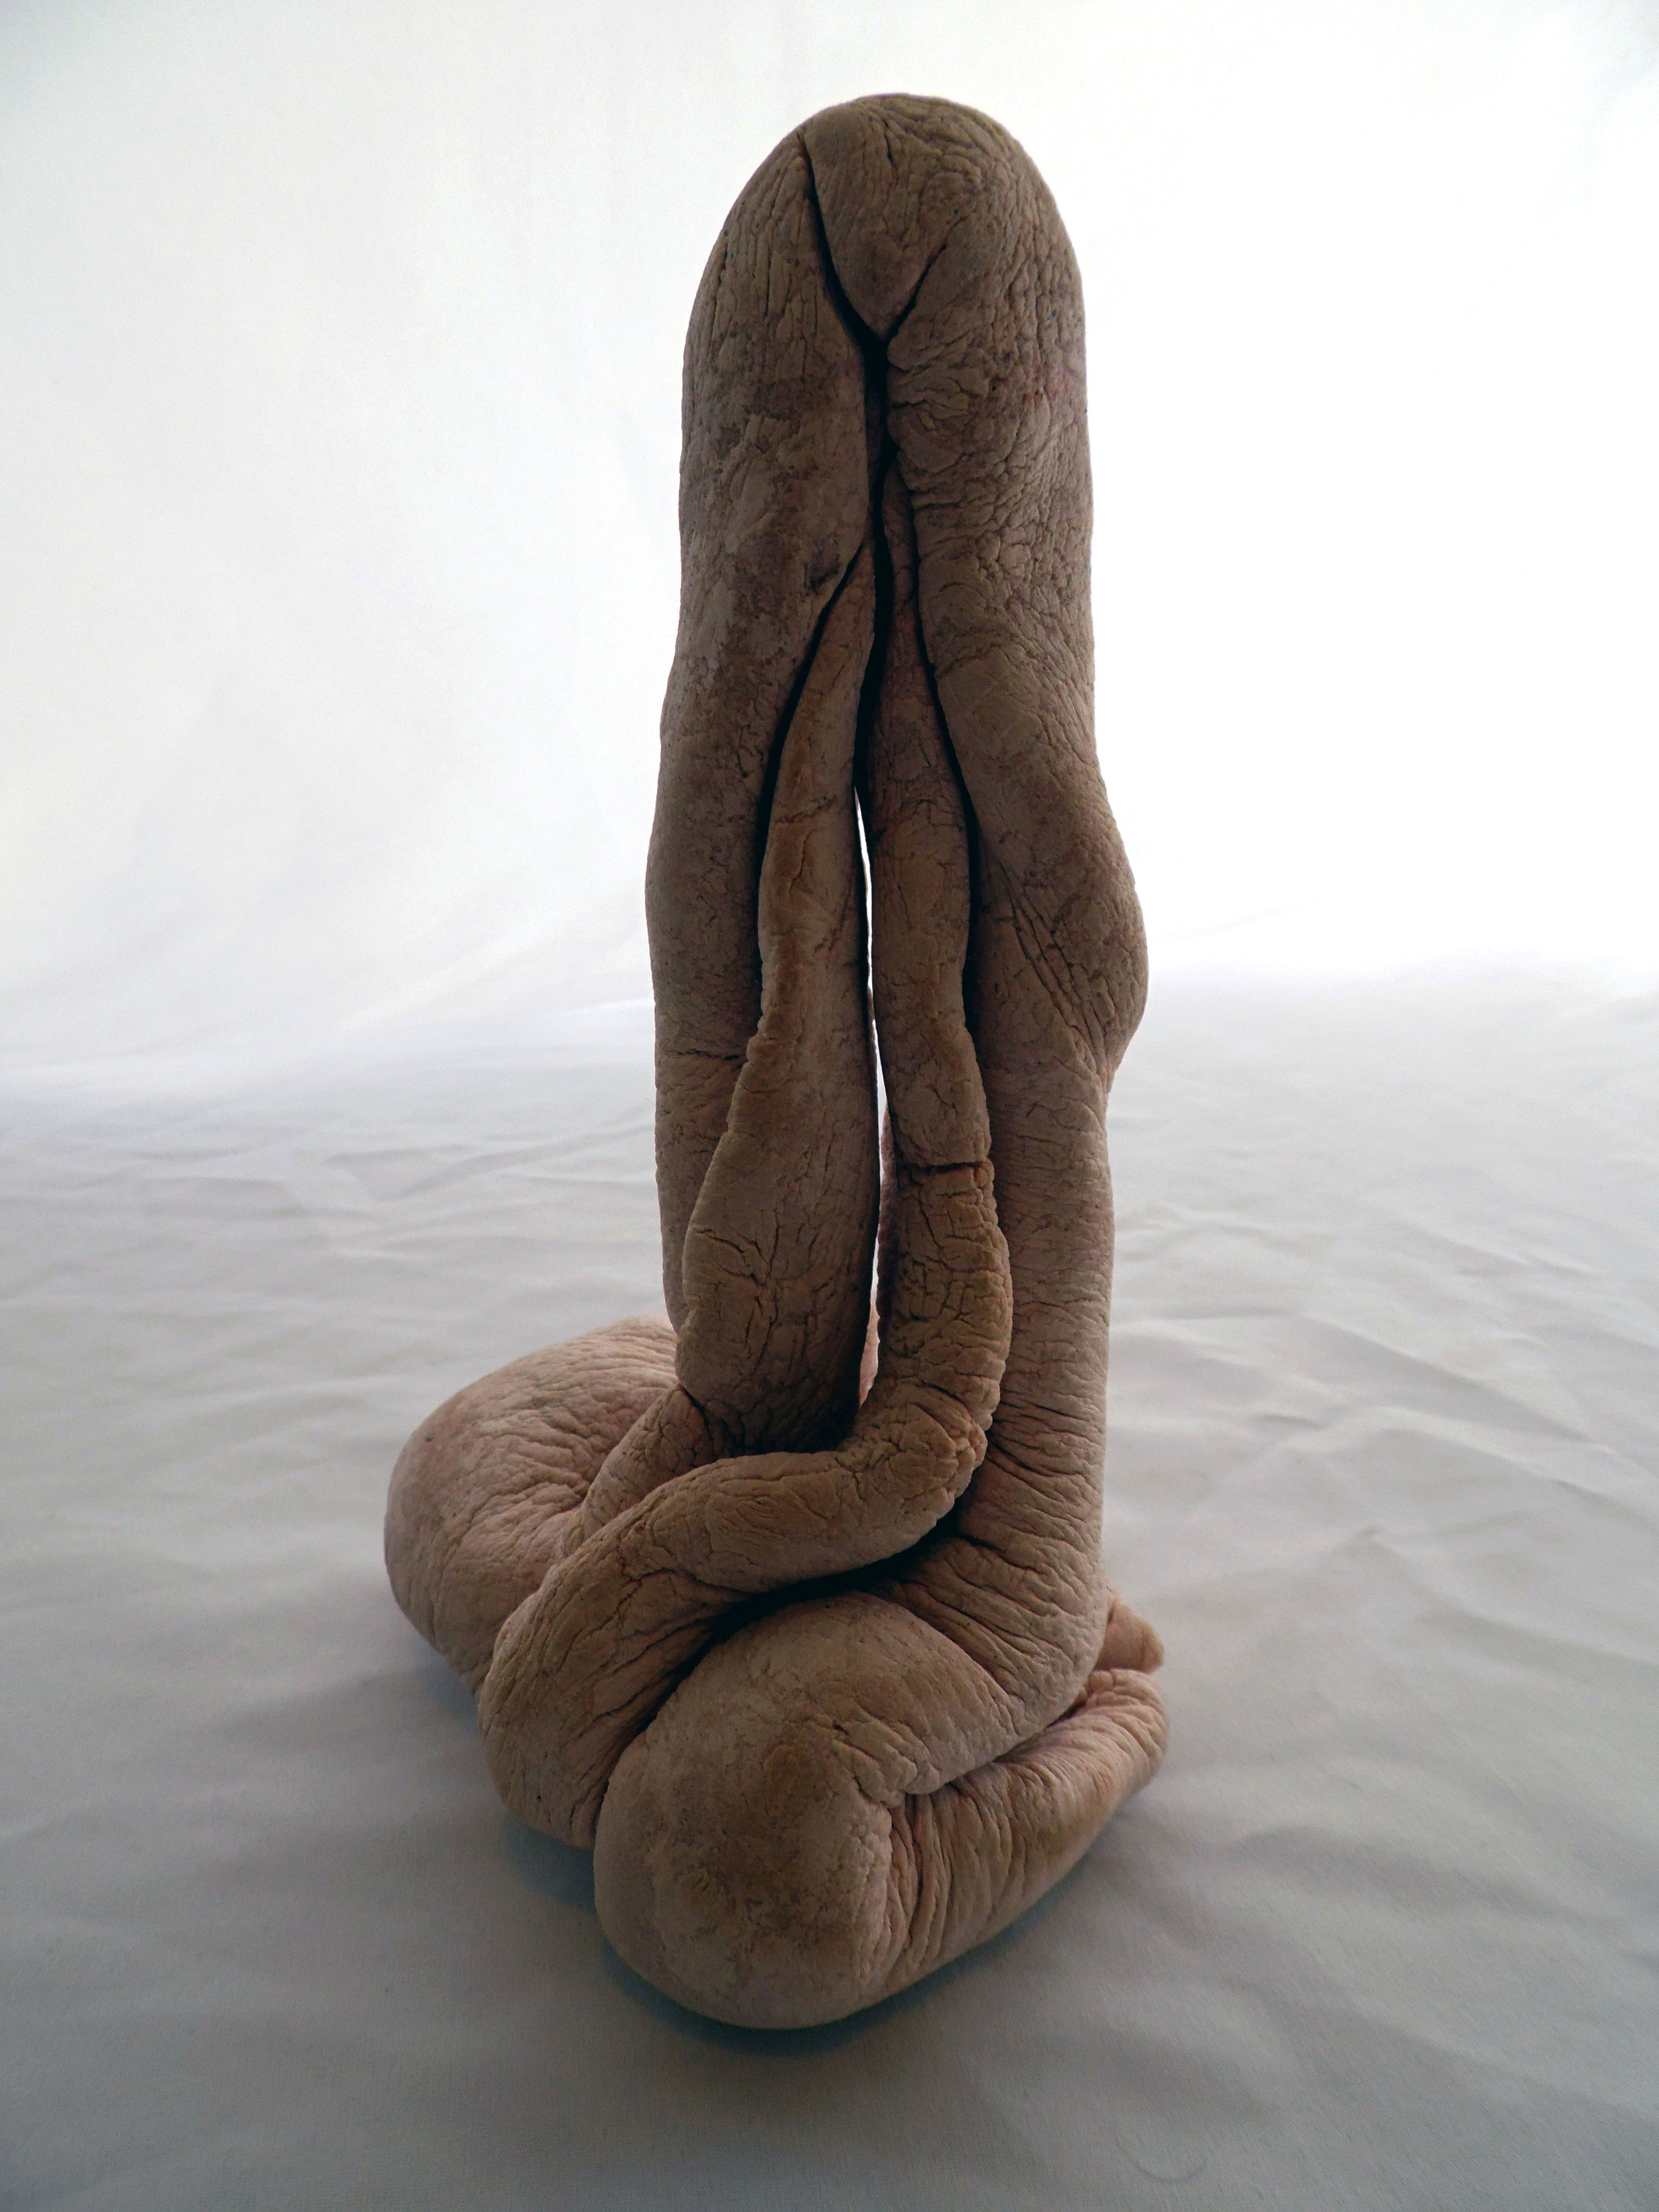 Franklin Cassaro, Nodus Chorda Vulviforme Rósea